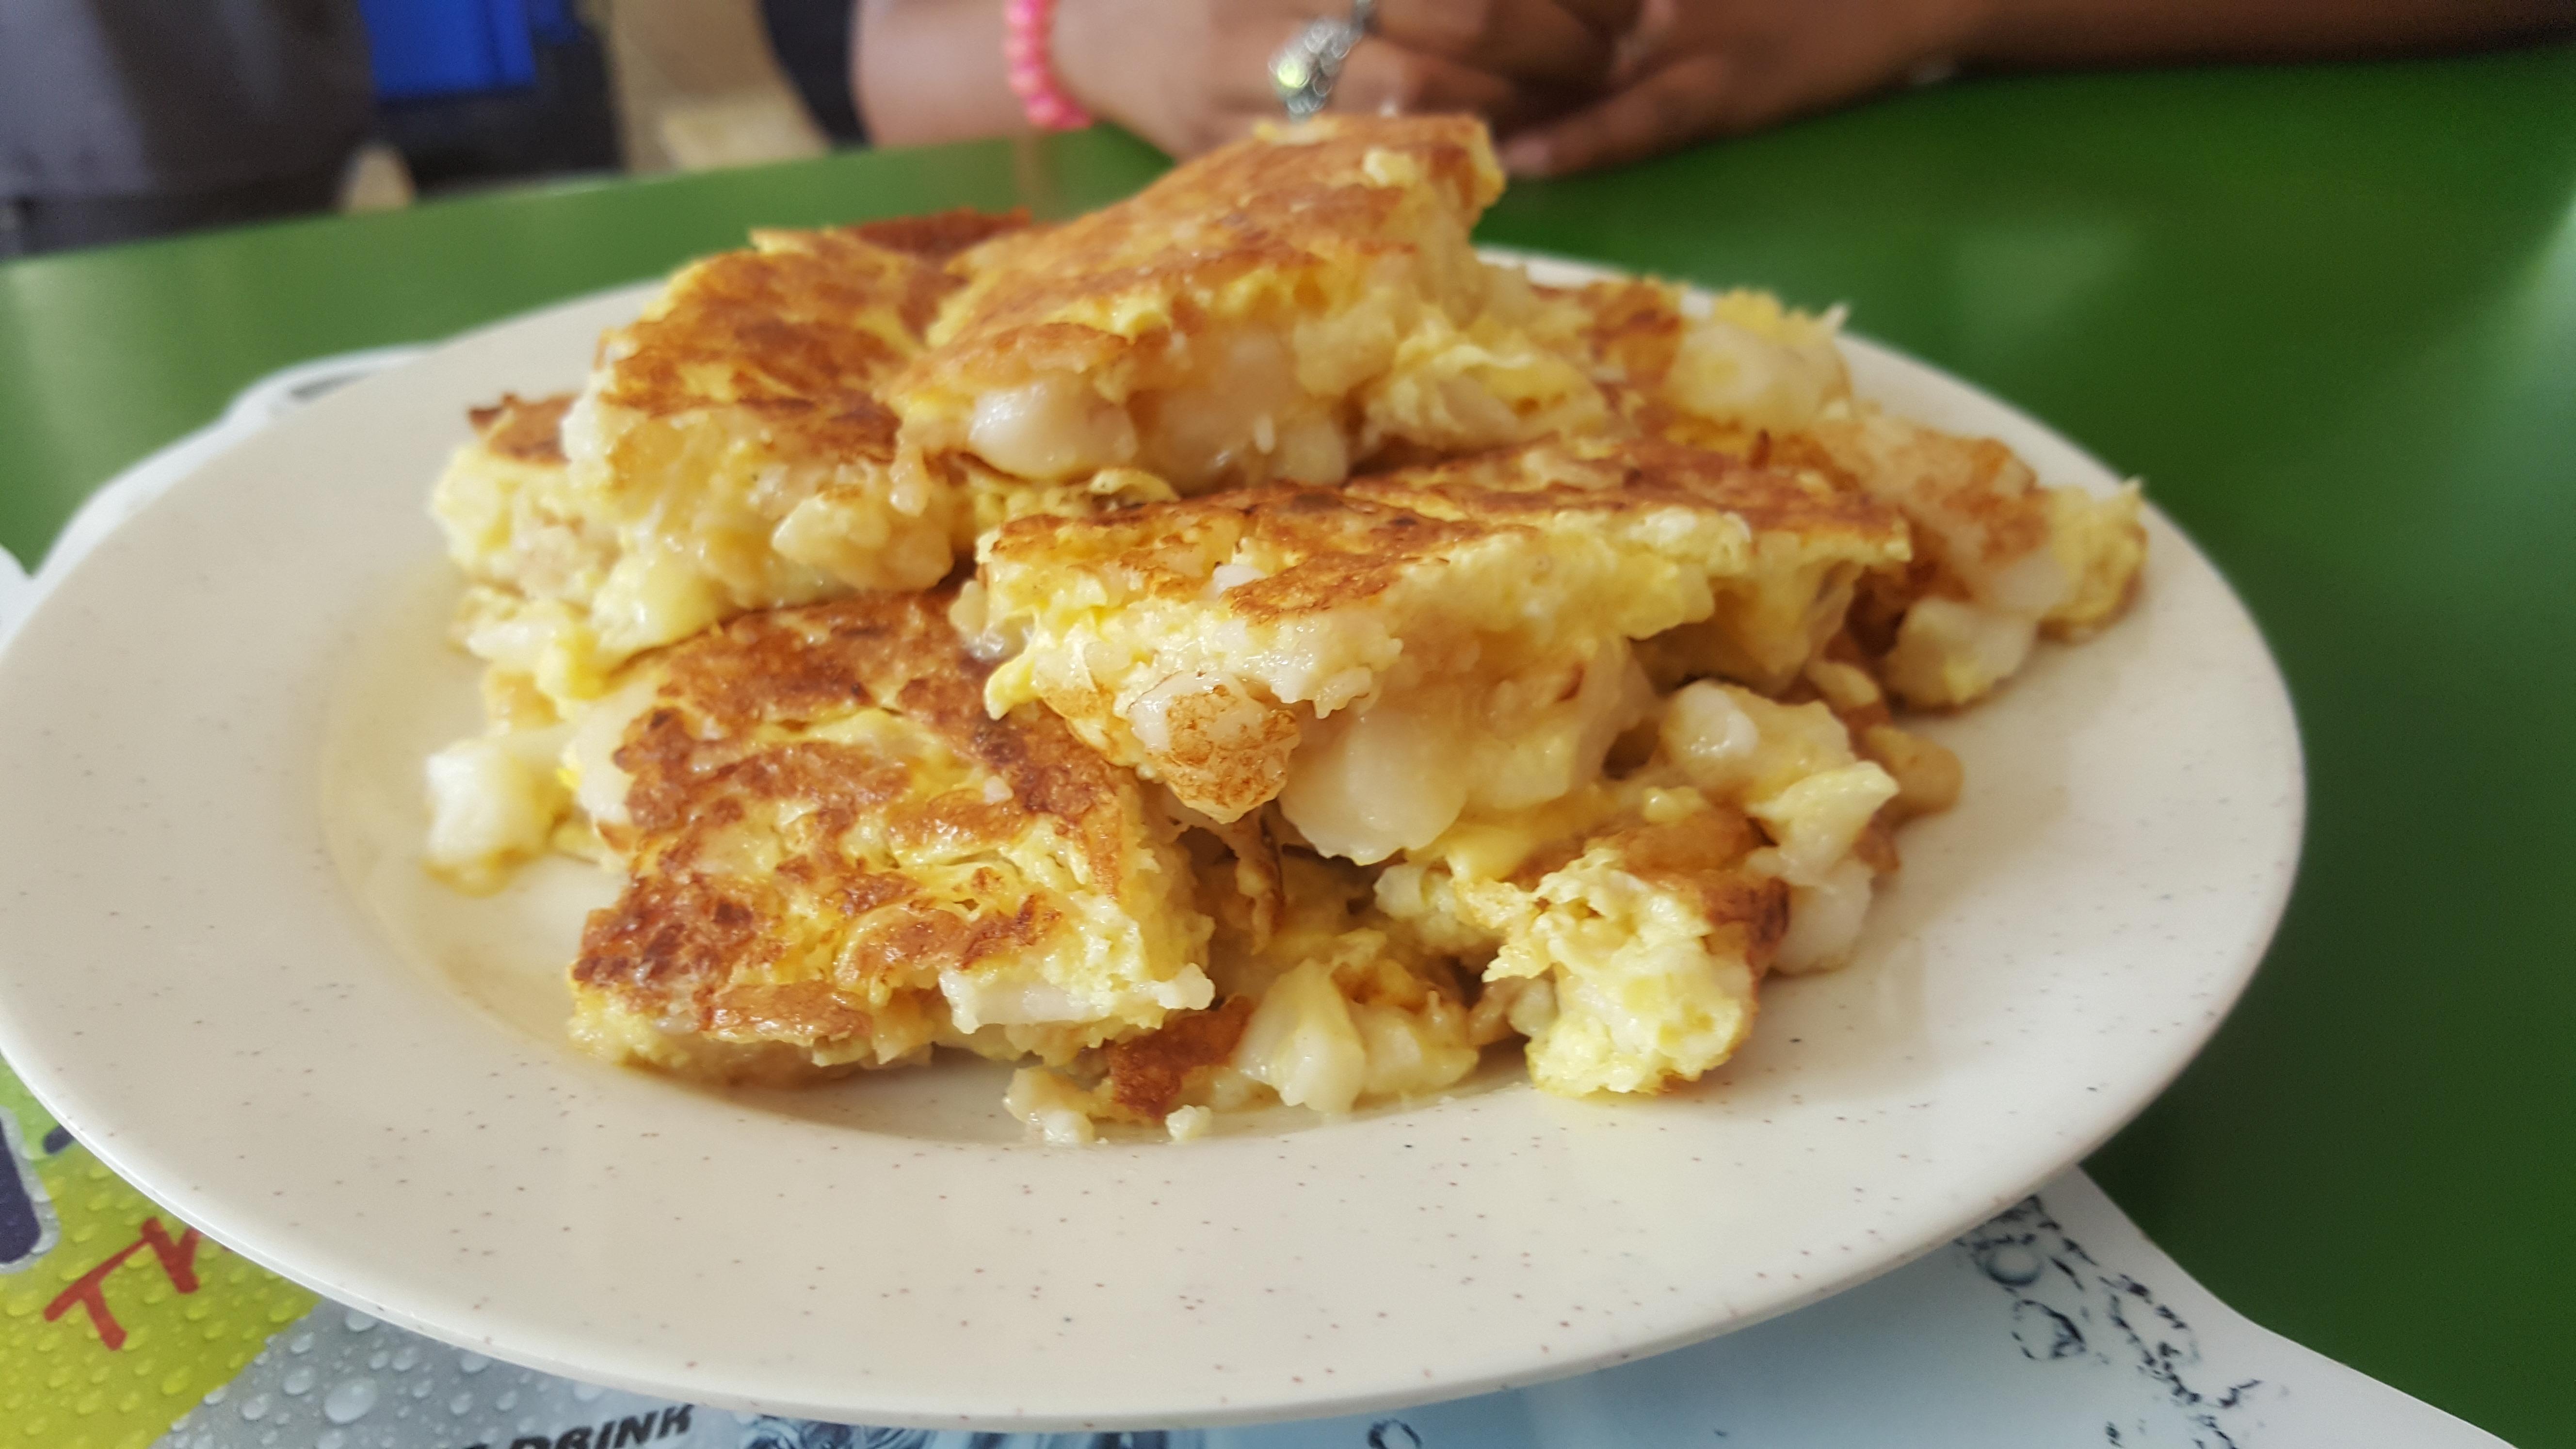 Singapore Food Staples: Carrot Cake – Surprising Horizons